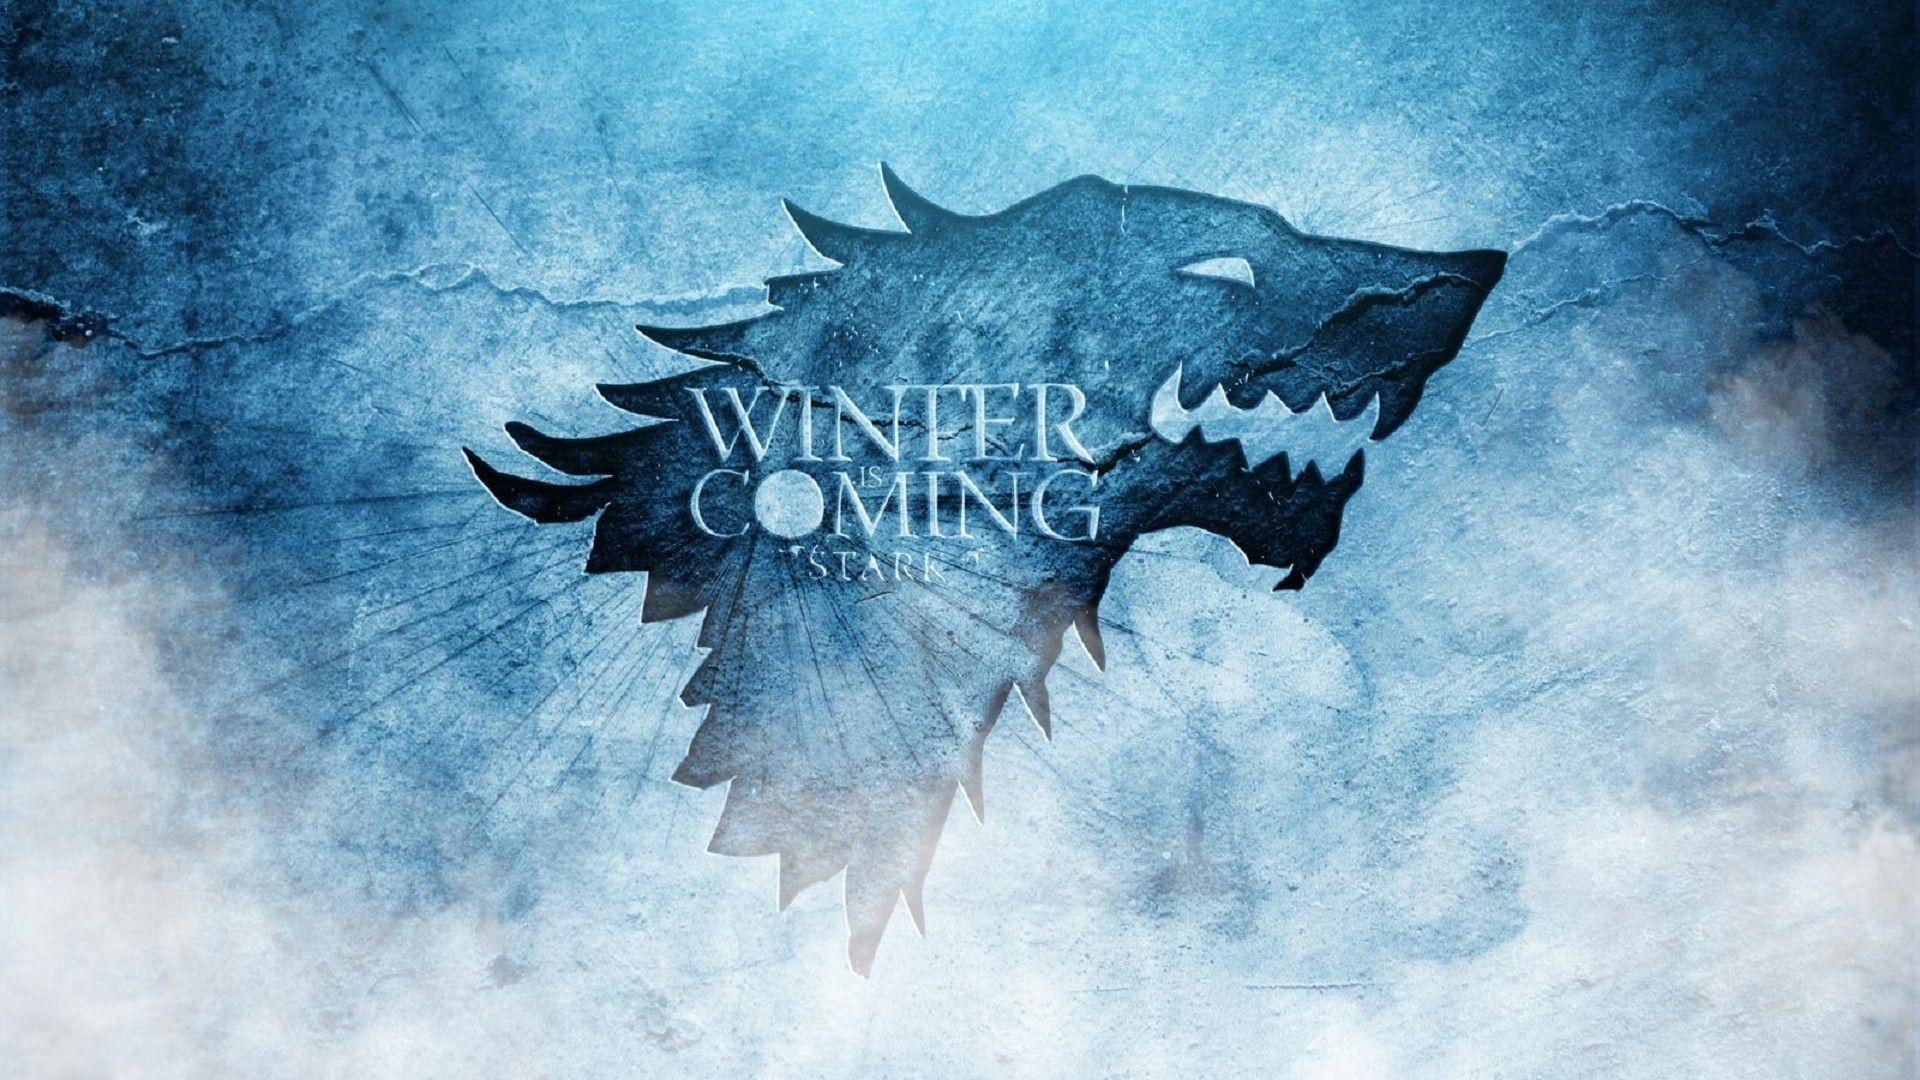 winter is coming wallpaper hd